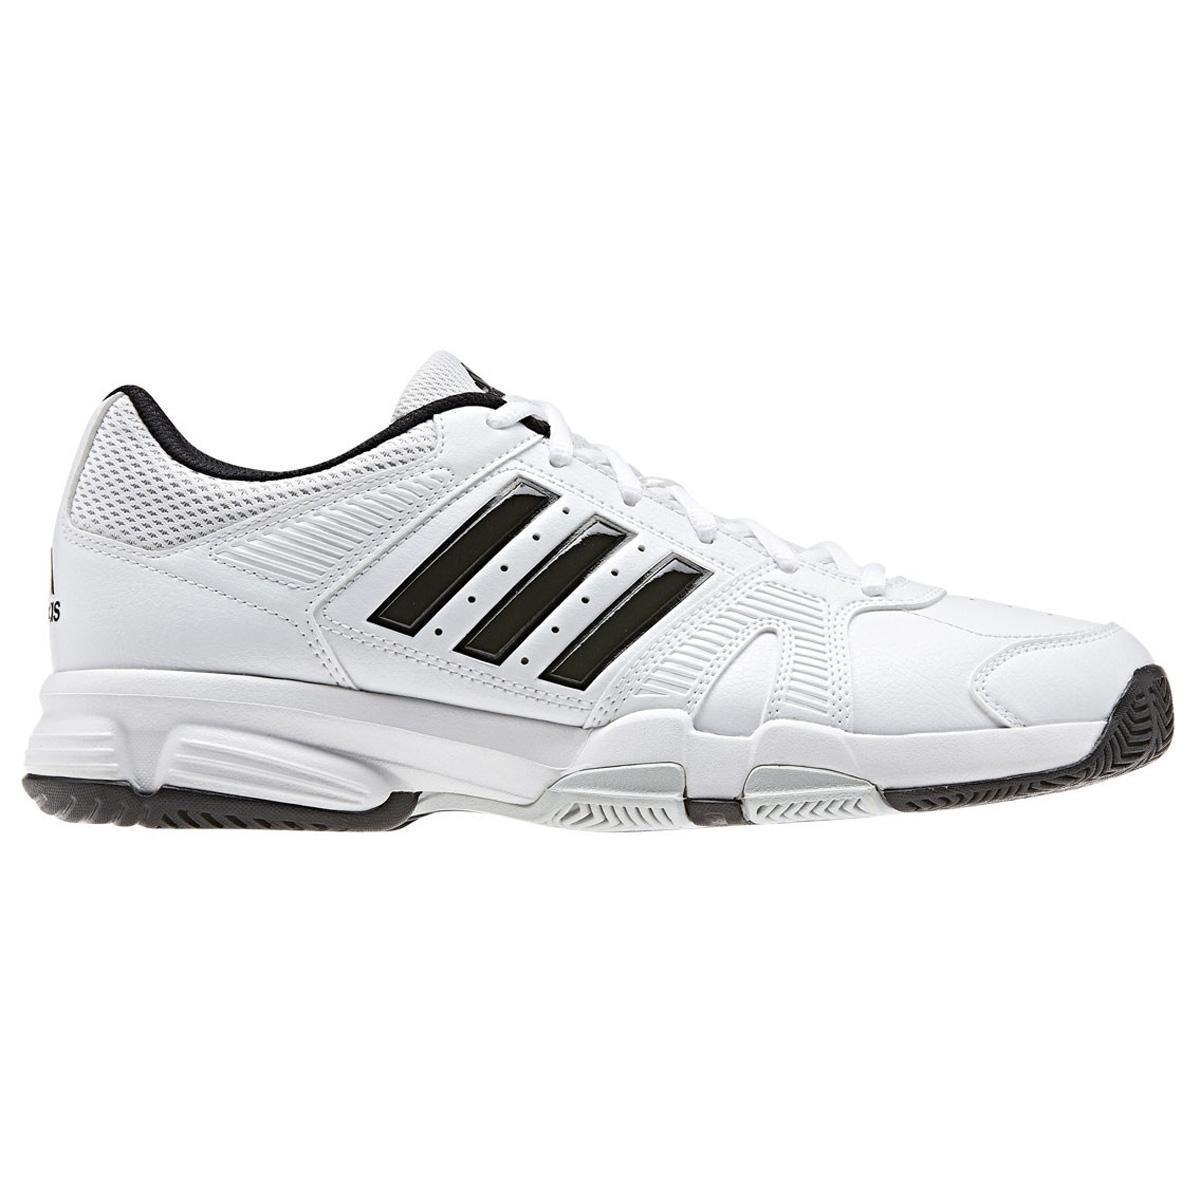 1f719bf831fb5a Adidas Mens Barracks F10 Trainer - White - Tennisnuts.com